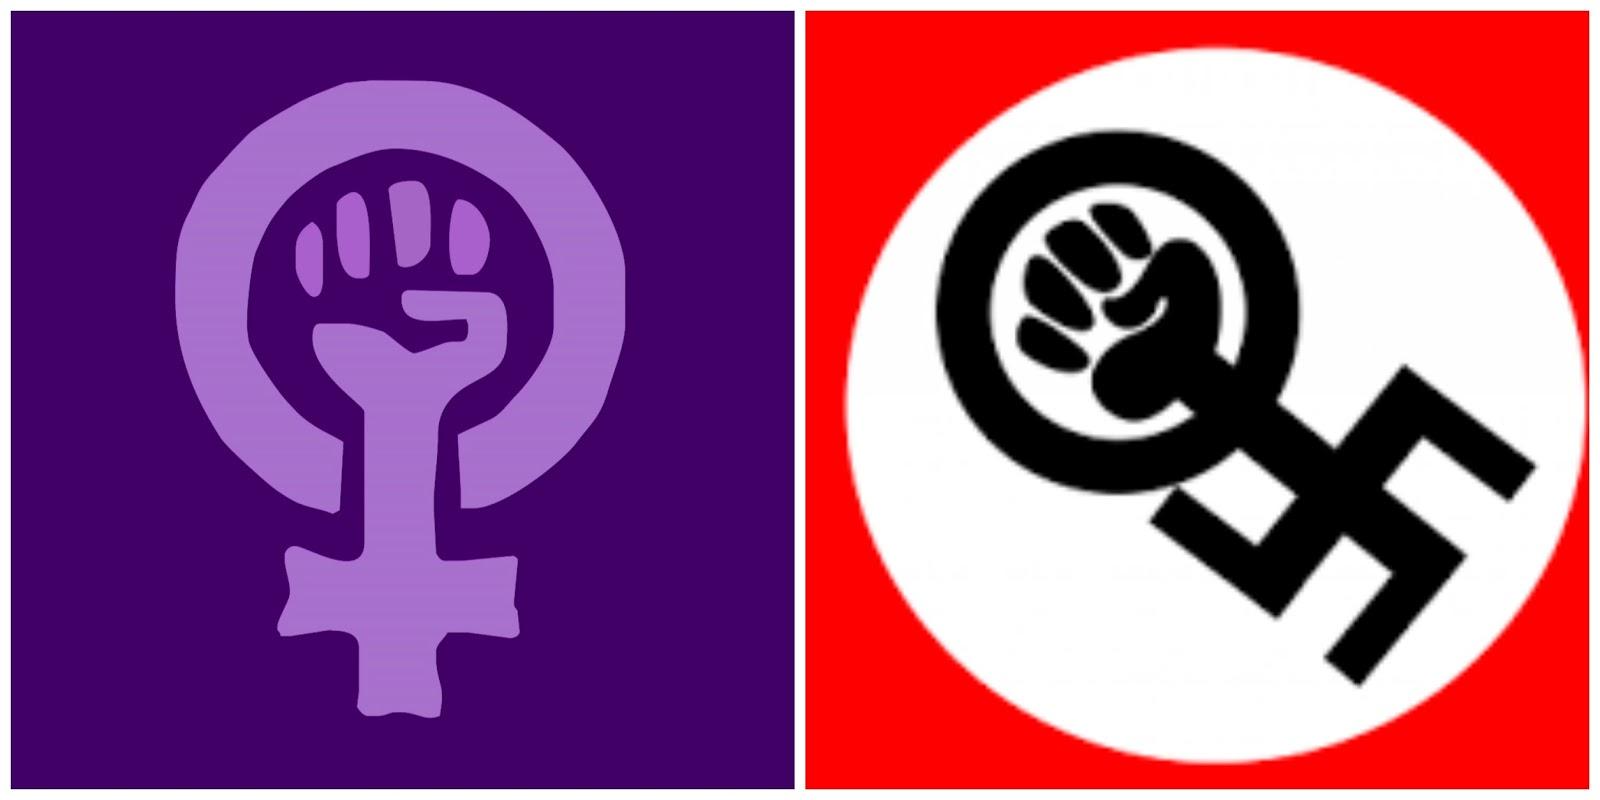 feminisme symbool